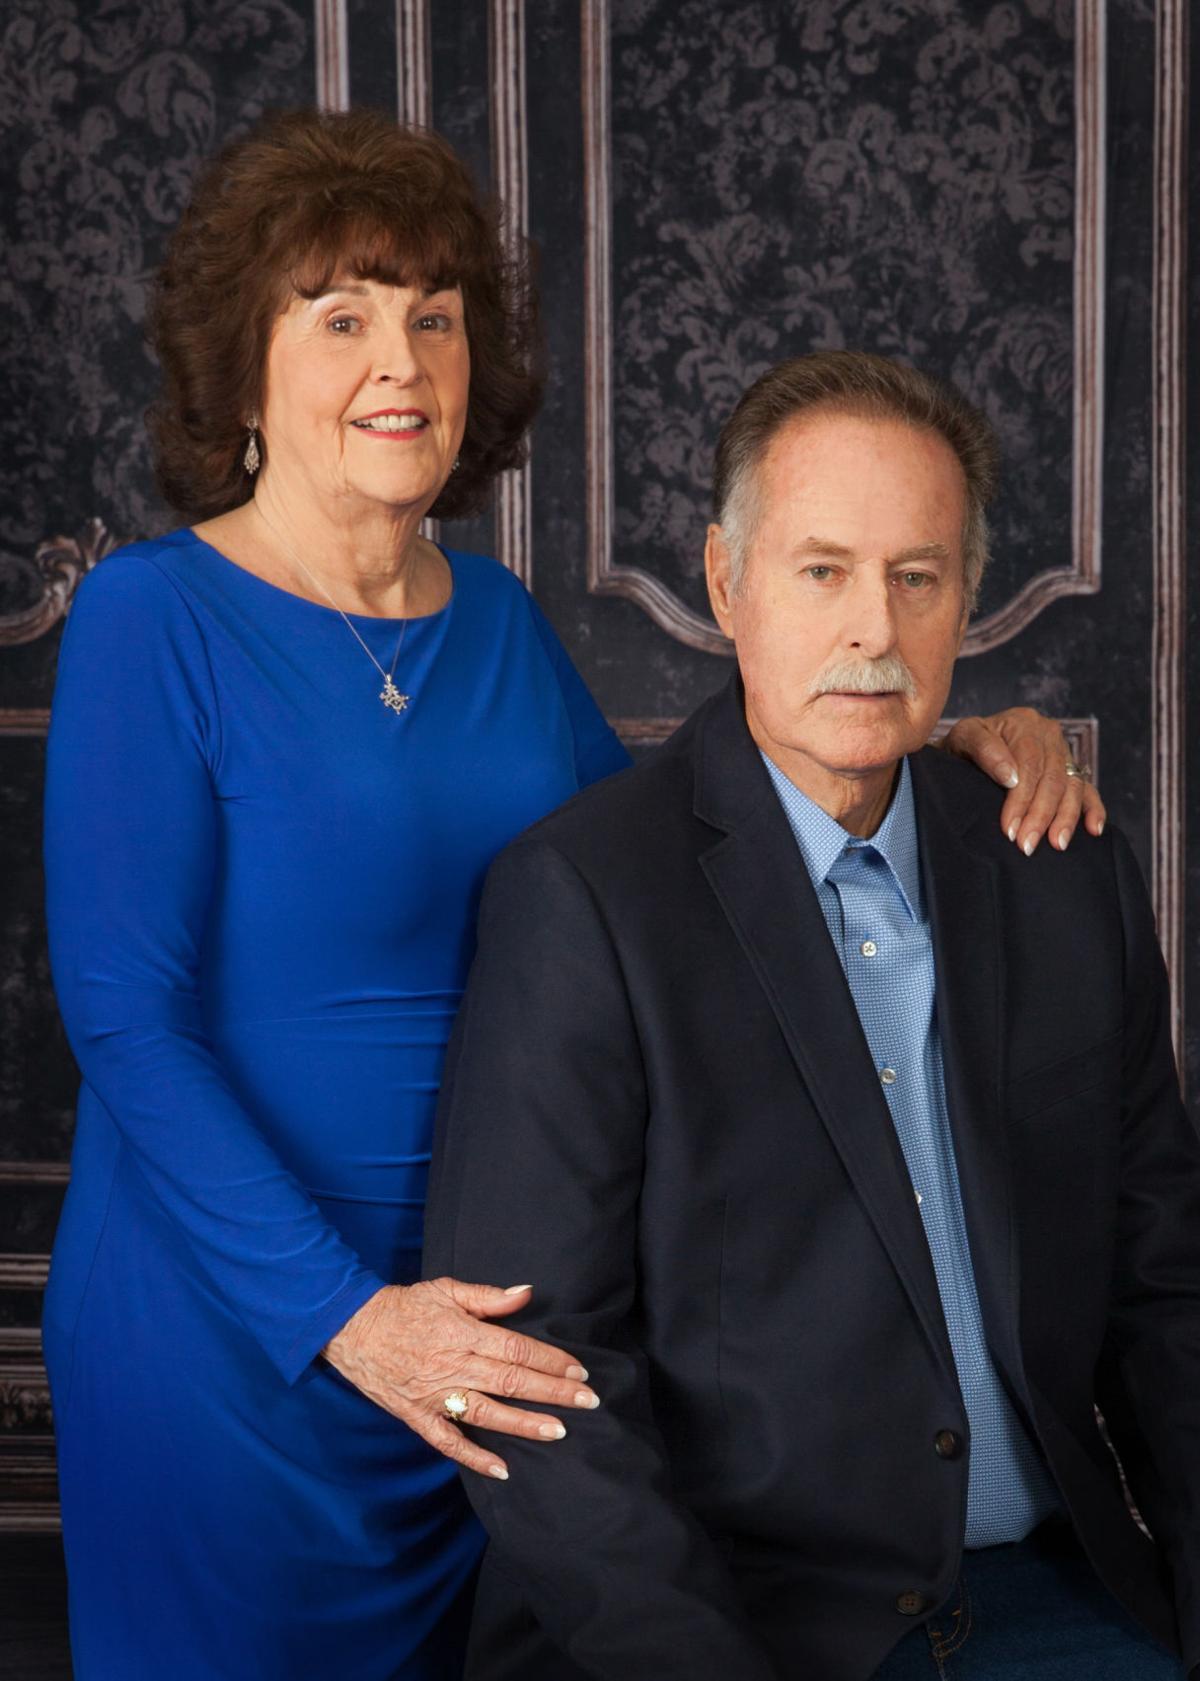 50th anniversary: Jim and Darlene Schmidt